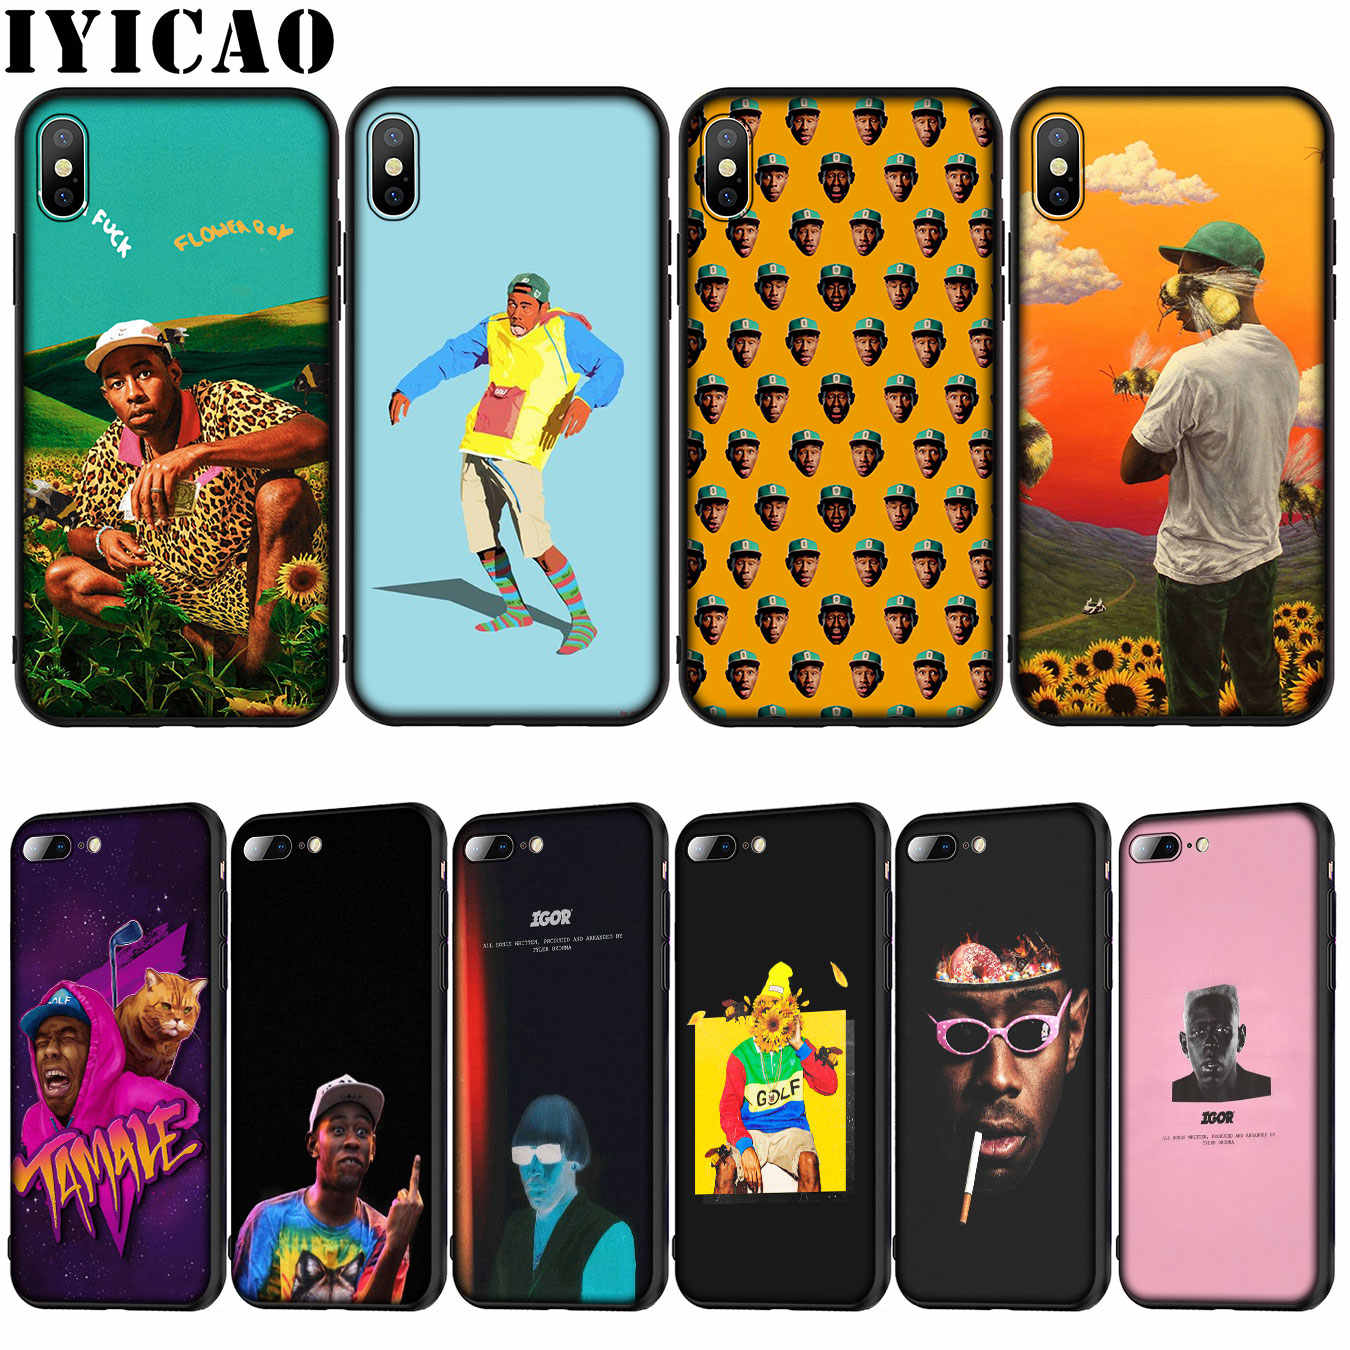 IYICAO Tyler The Creator Мягкий силиконовый чехол для iPhone XR X XS 11 Pro Max 10 6 6S 7 8 плюс 5 5S SE чехол для телефона